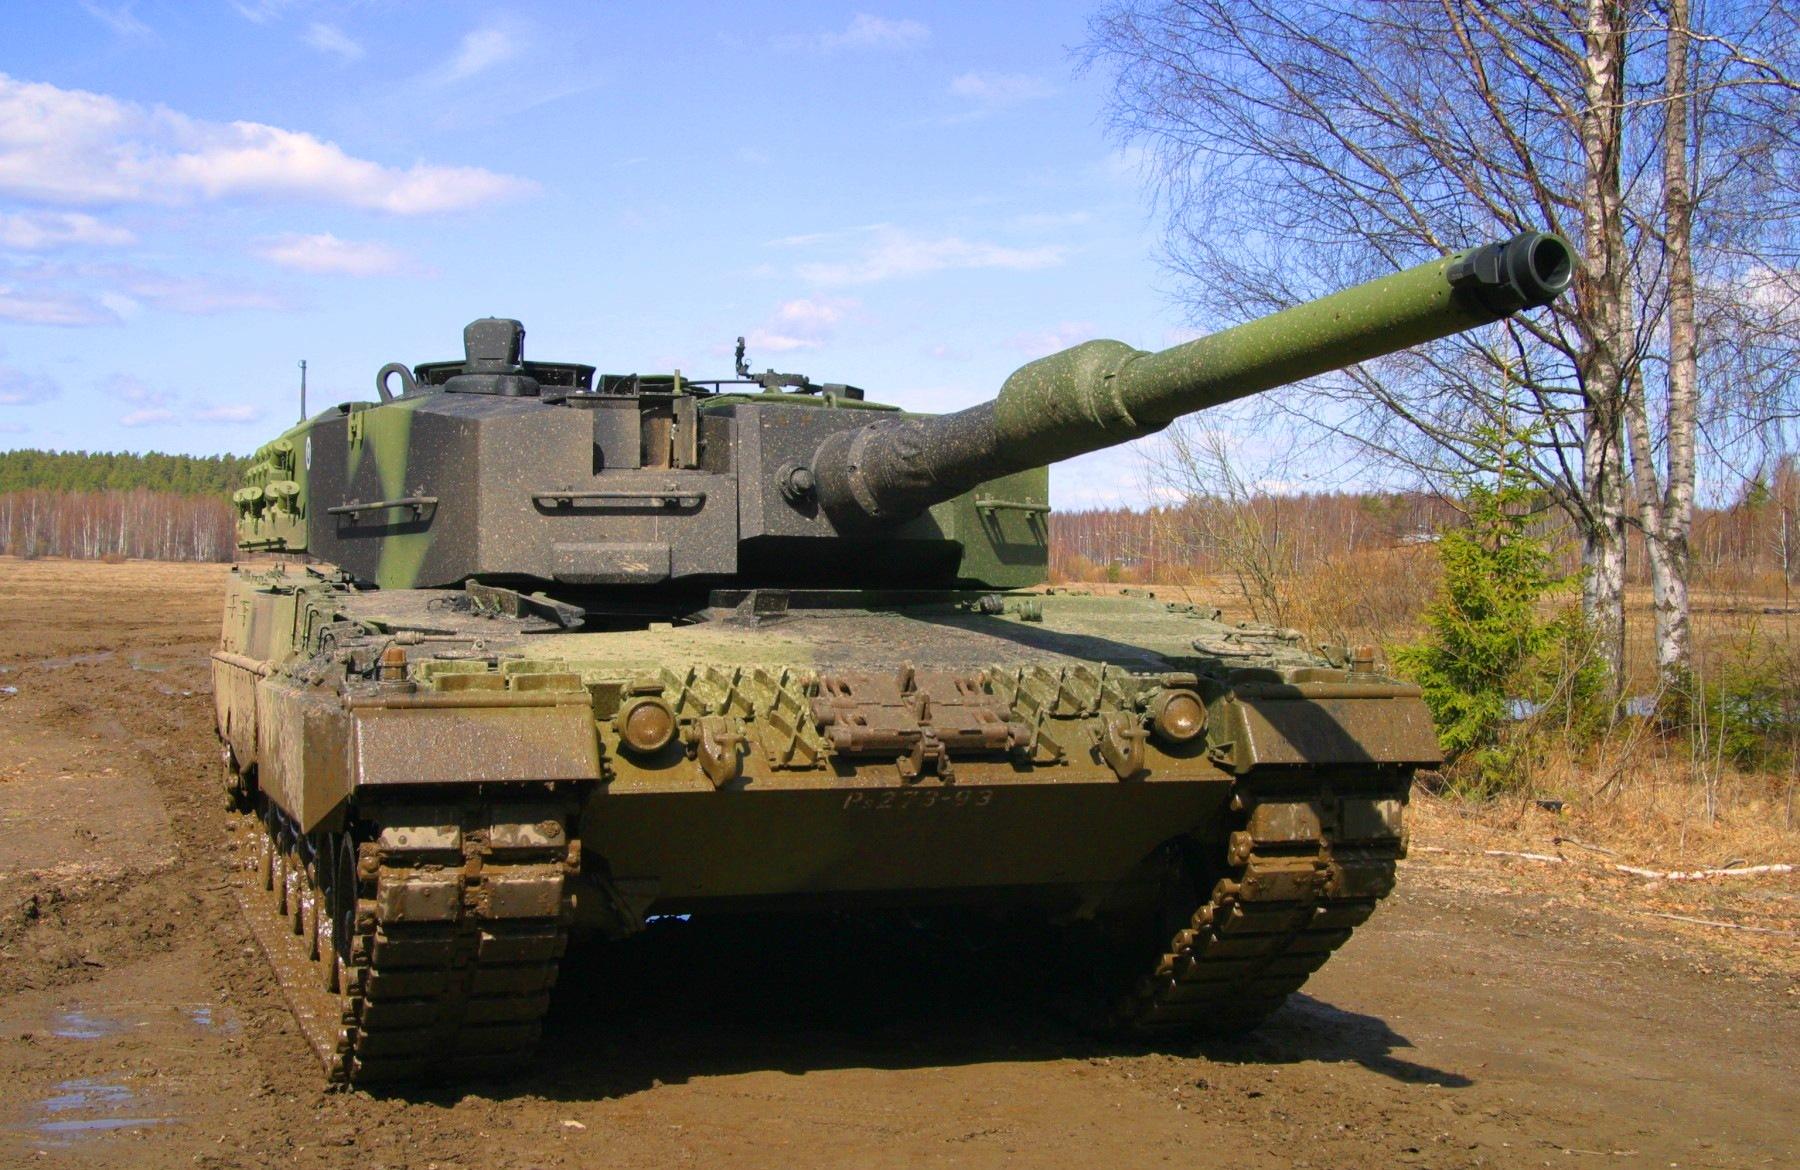 Army tank 1800 x 1170 download close